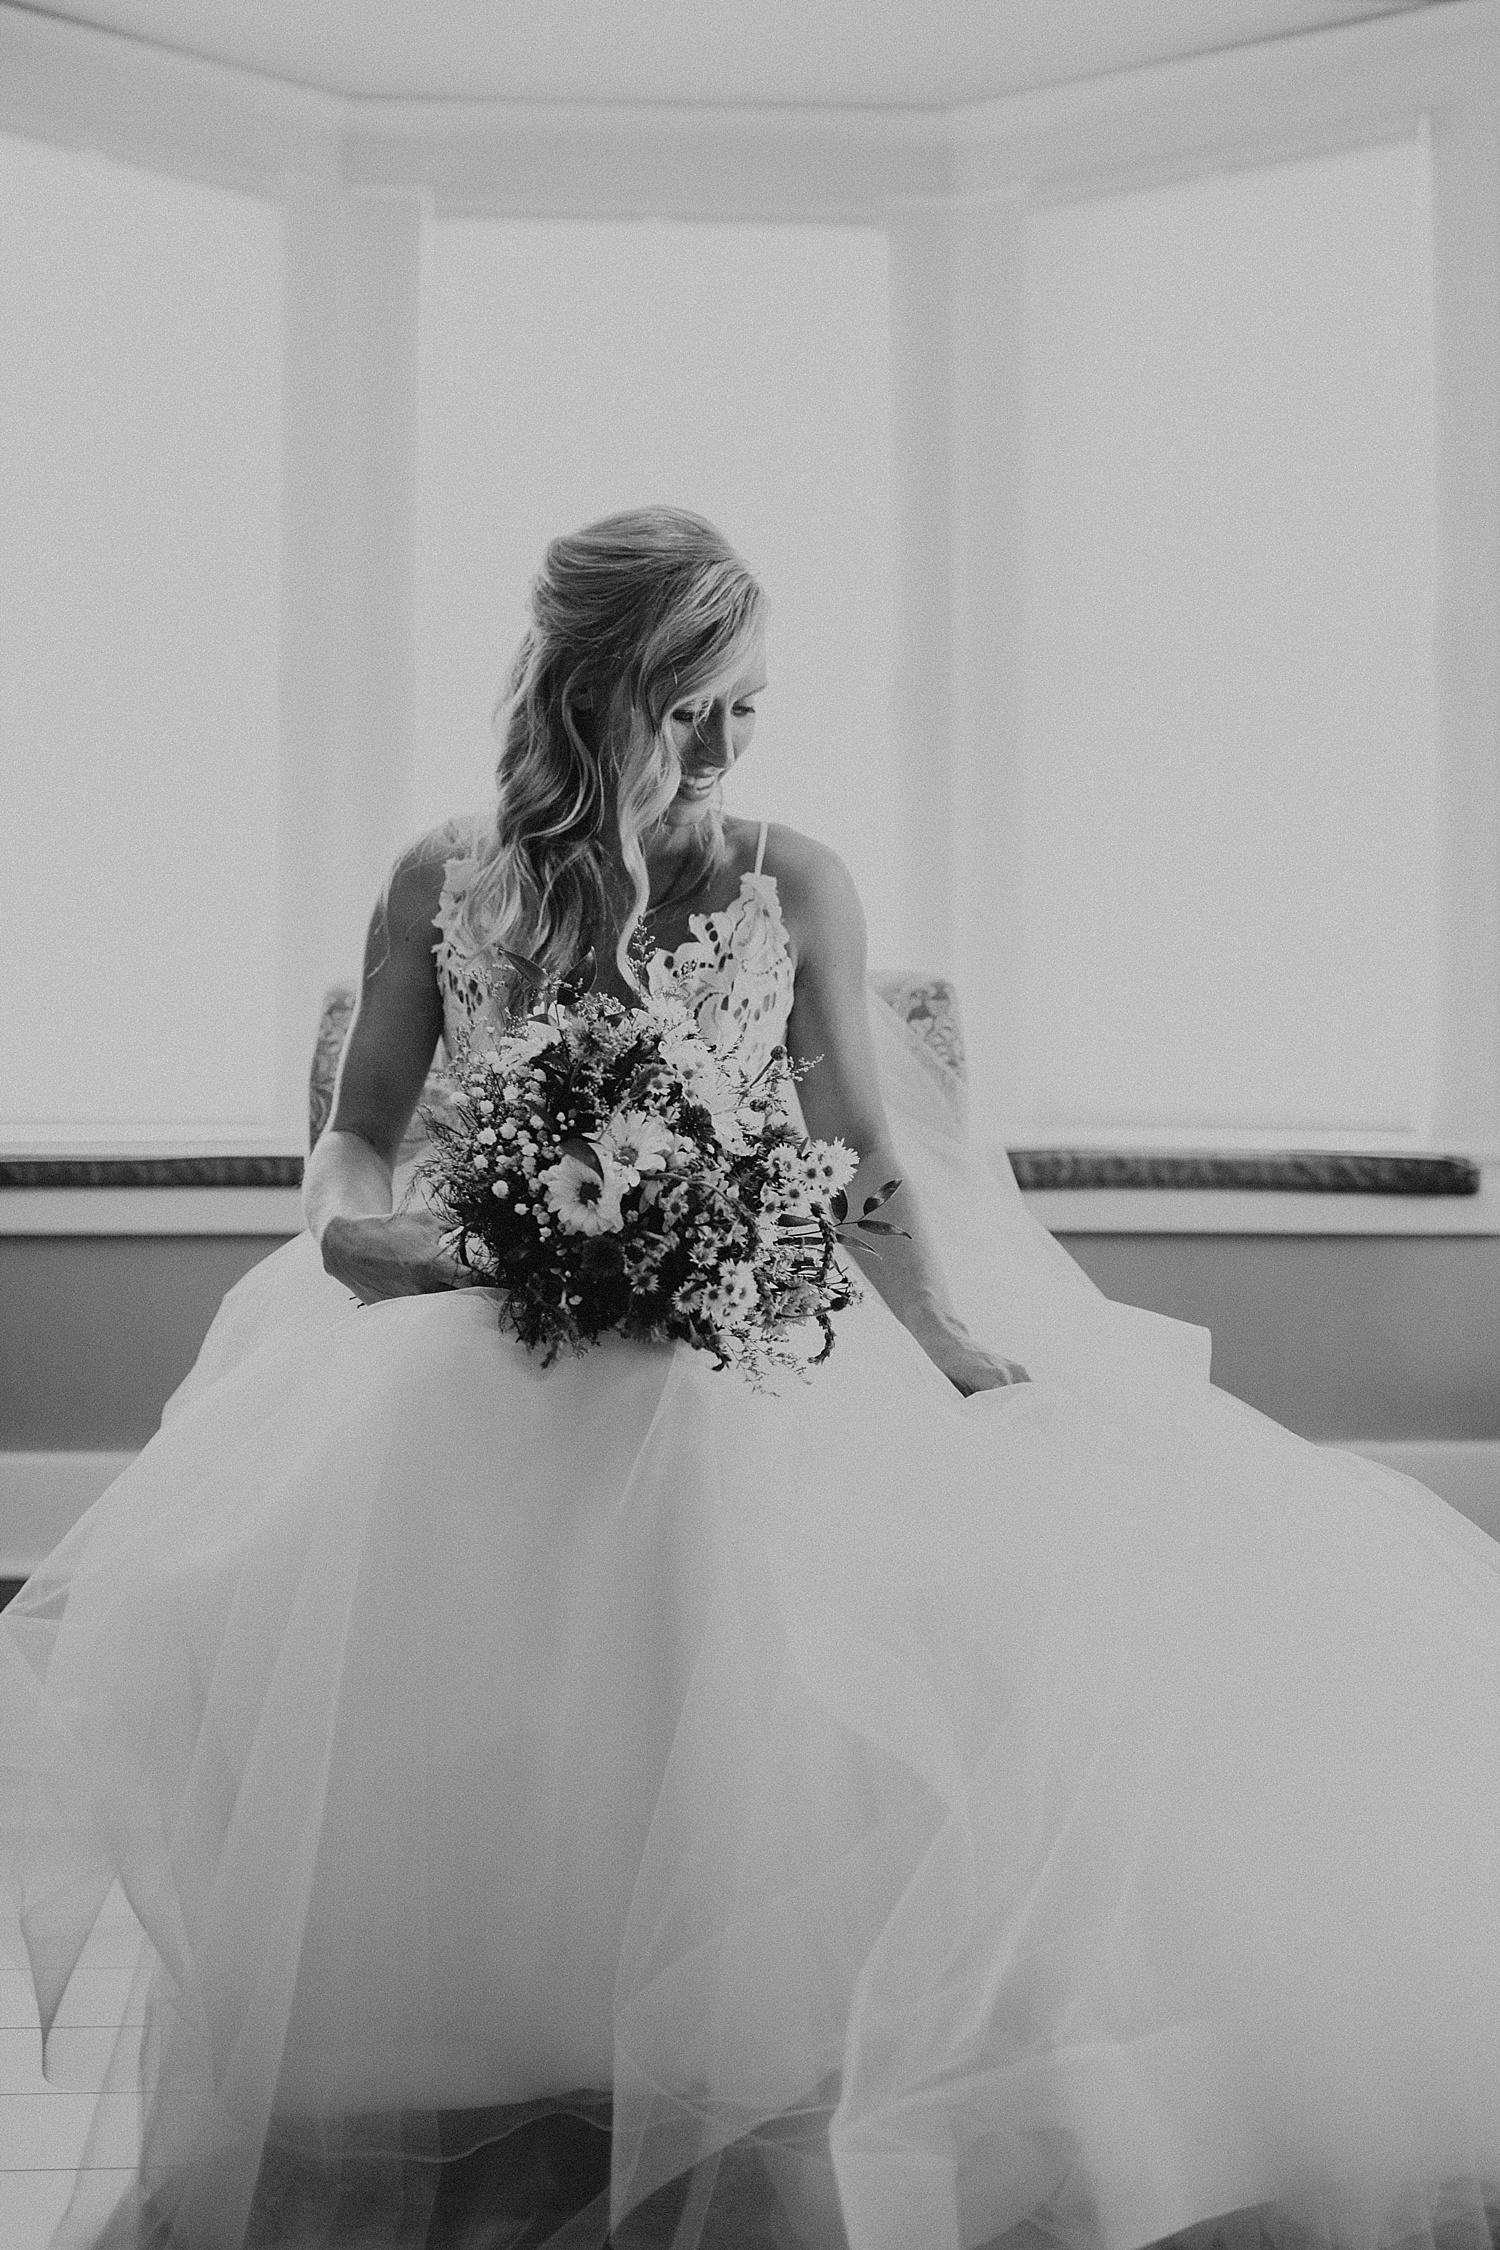 the-legacy-at-green-hills-wedding-nagel-portraits_0010.jpg